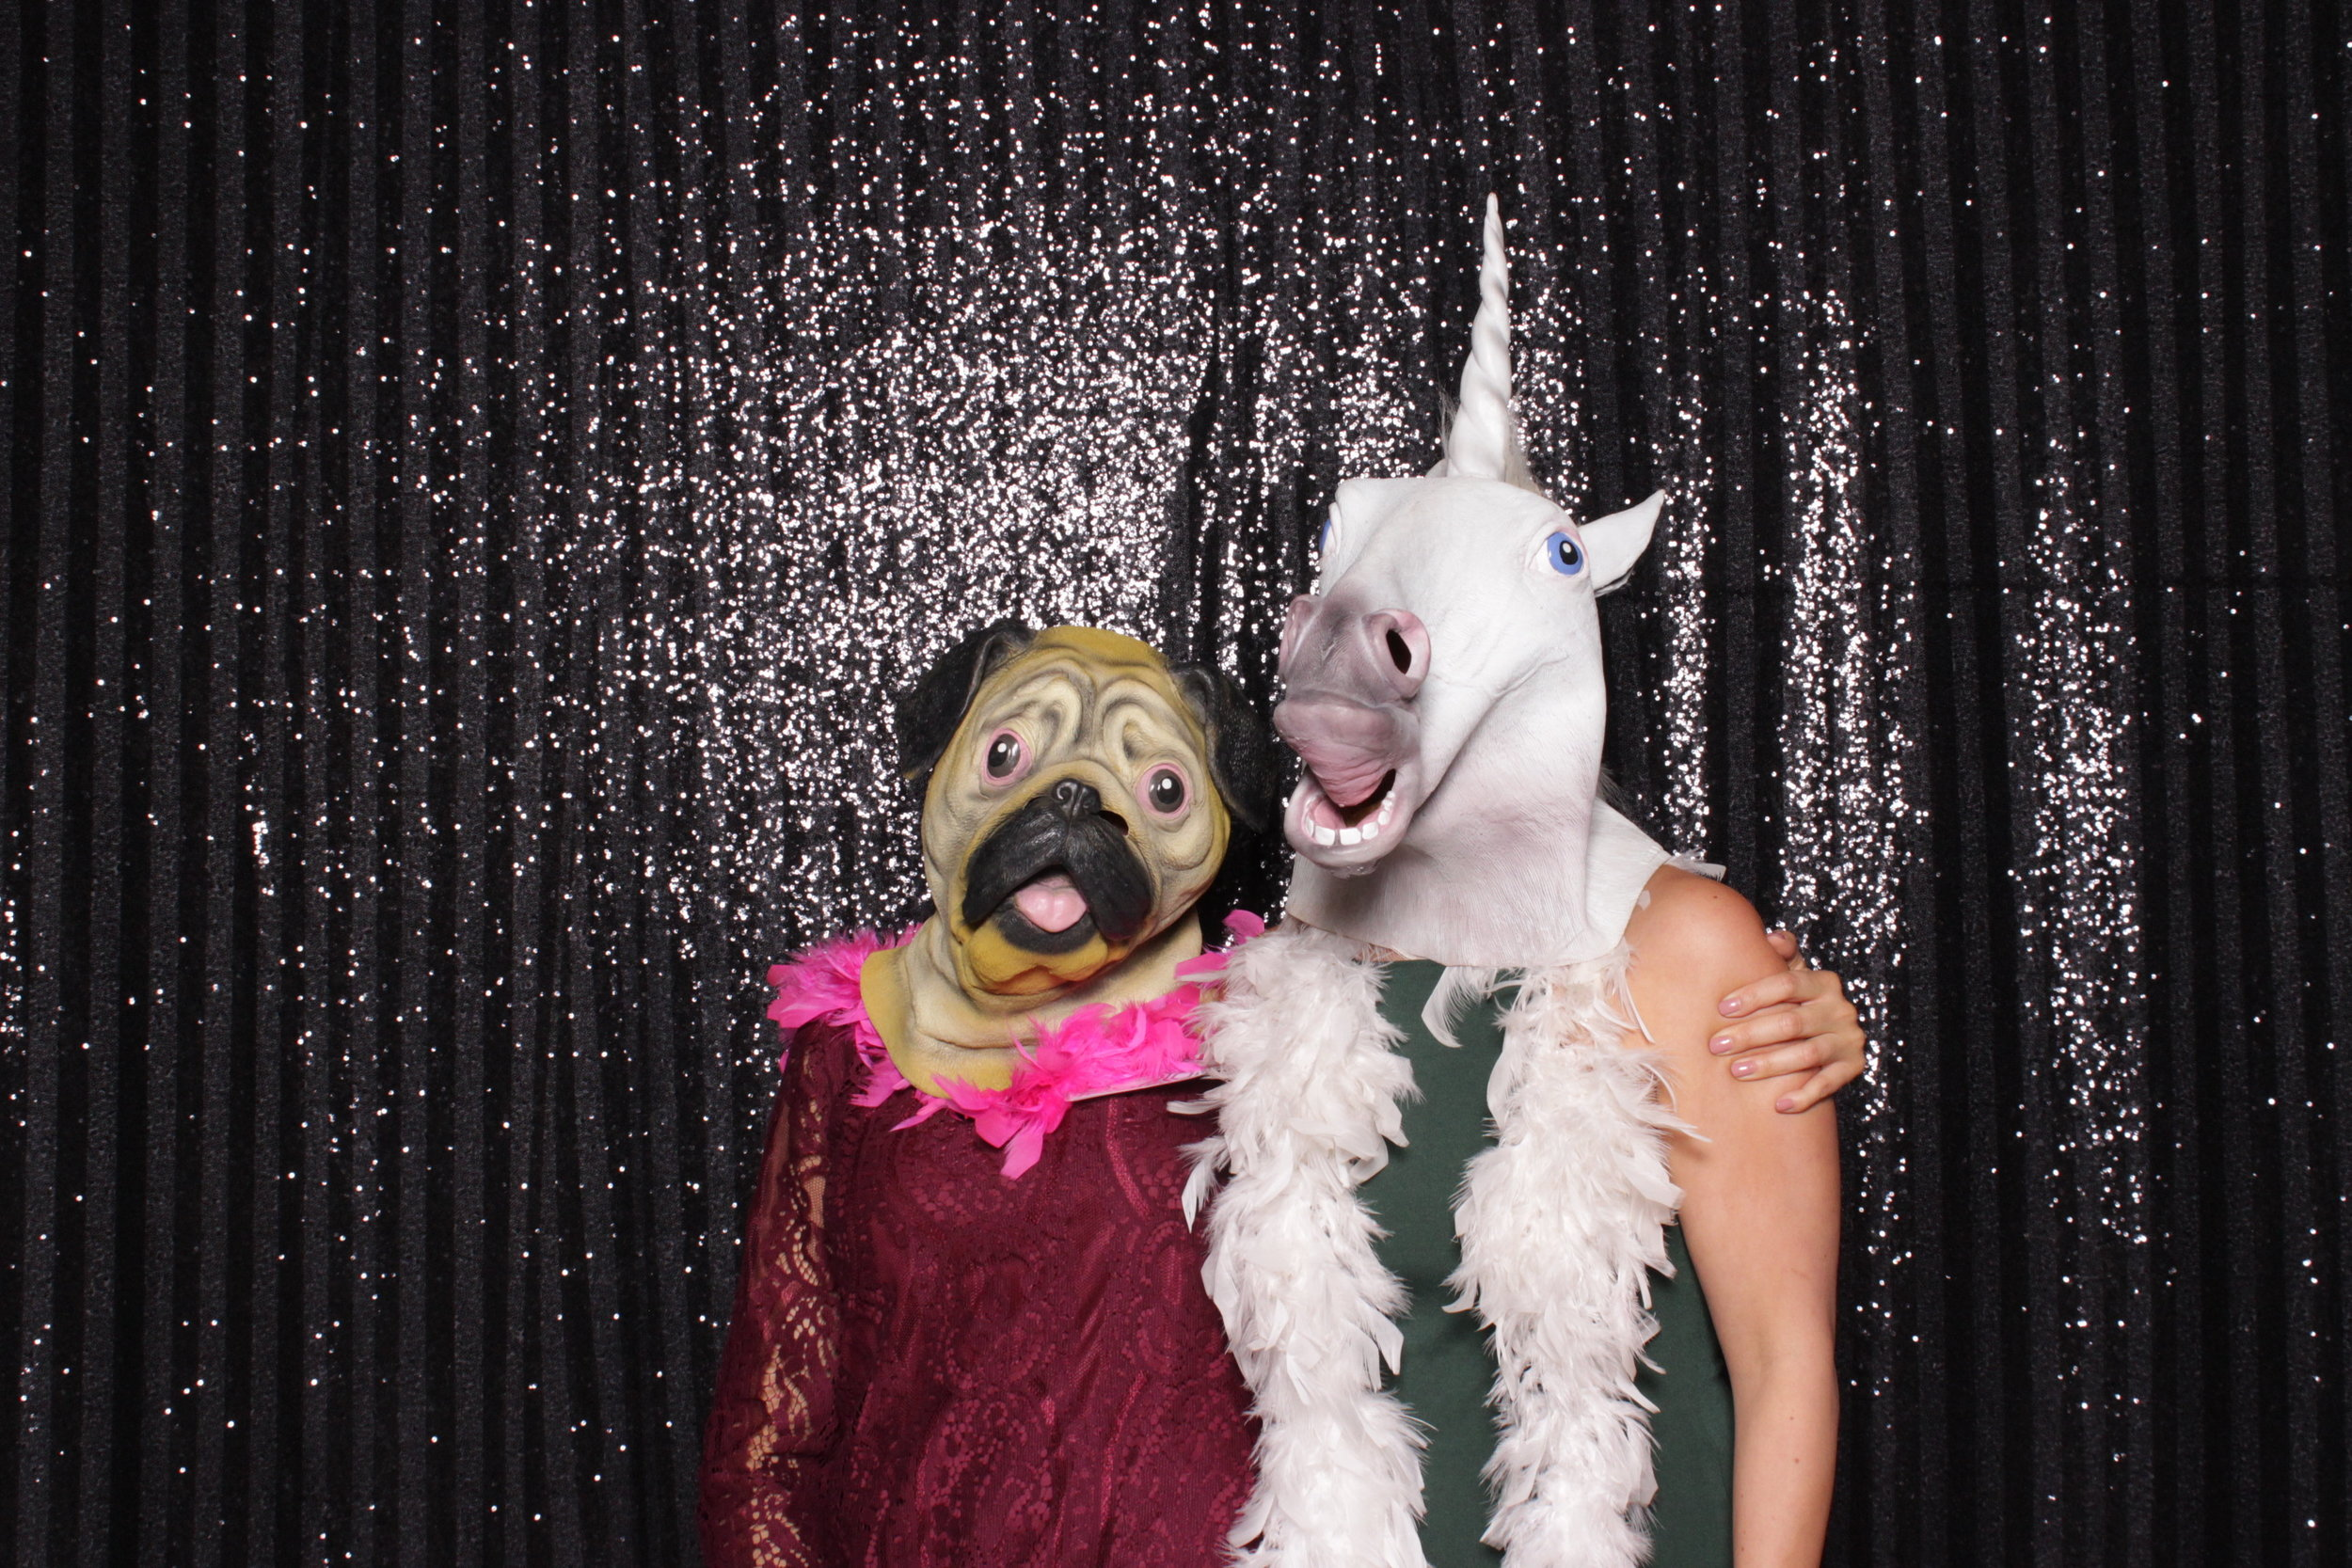 Chico-photo-booth-rental-unicorn-madness